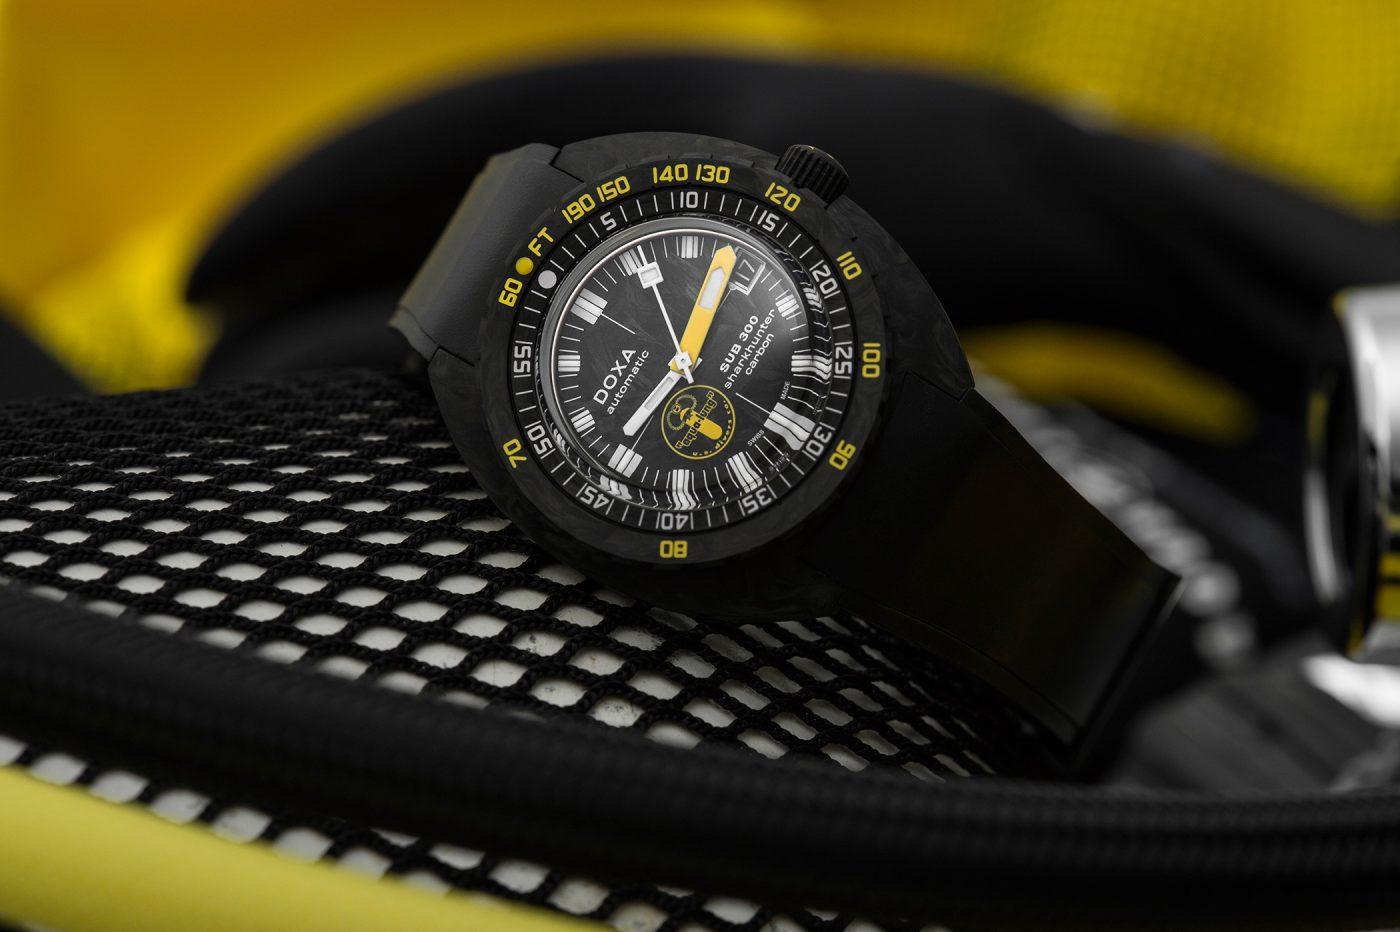 Doxa SUB 300 Carbon Aqua Lung US Divers [dostępność, cena]